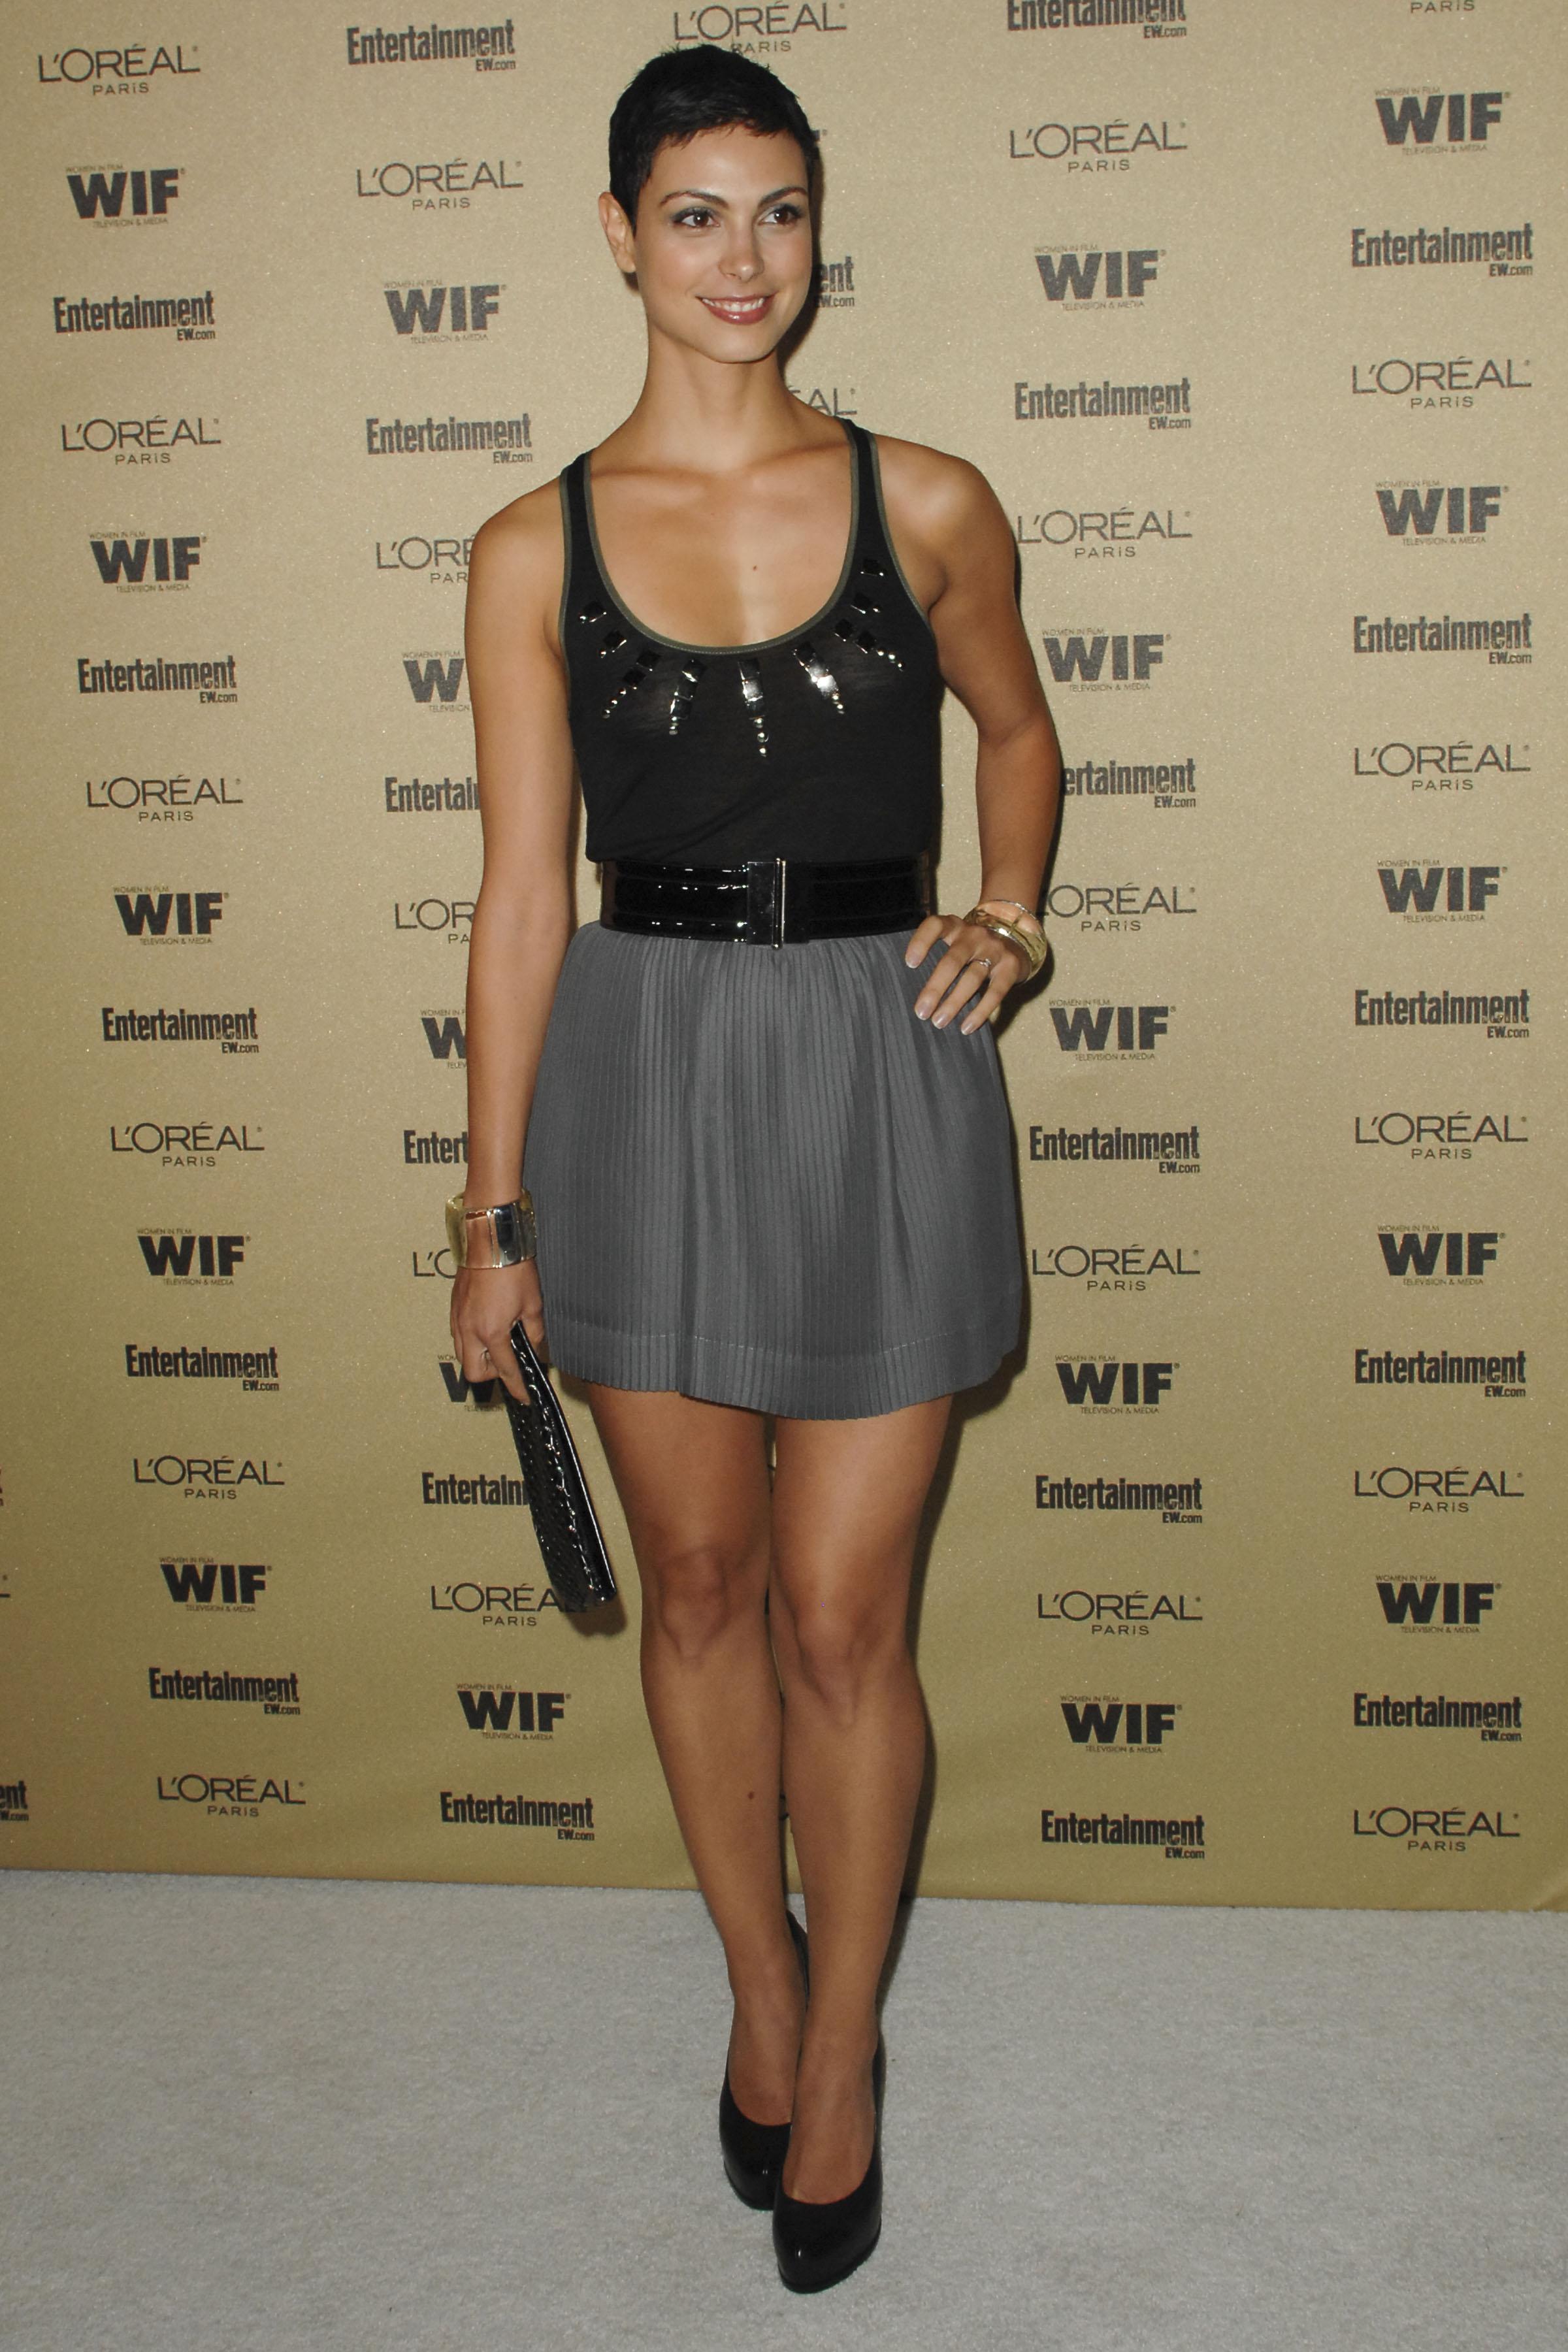 Morena baccarin brazilian actress image